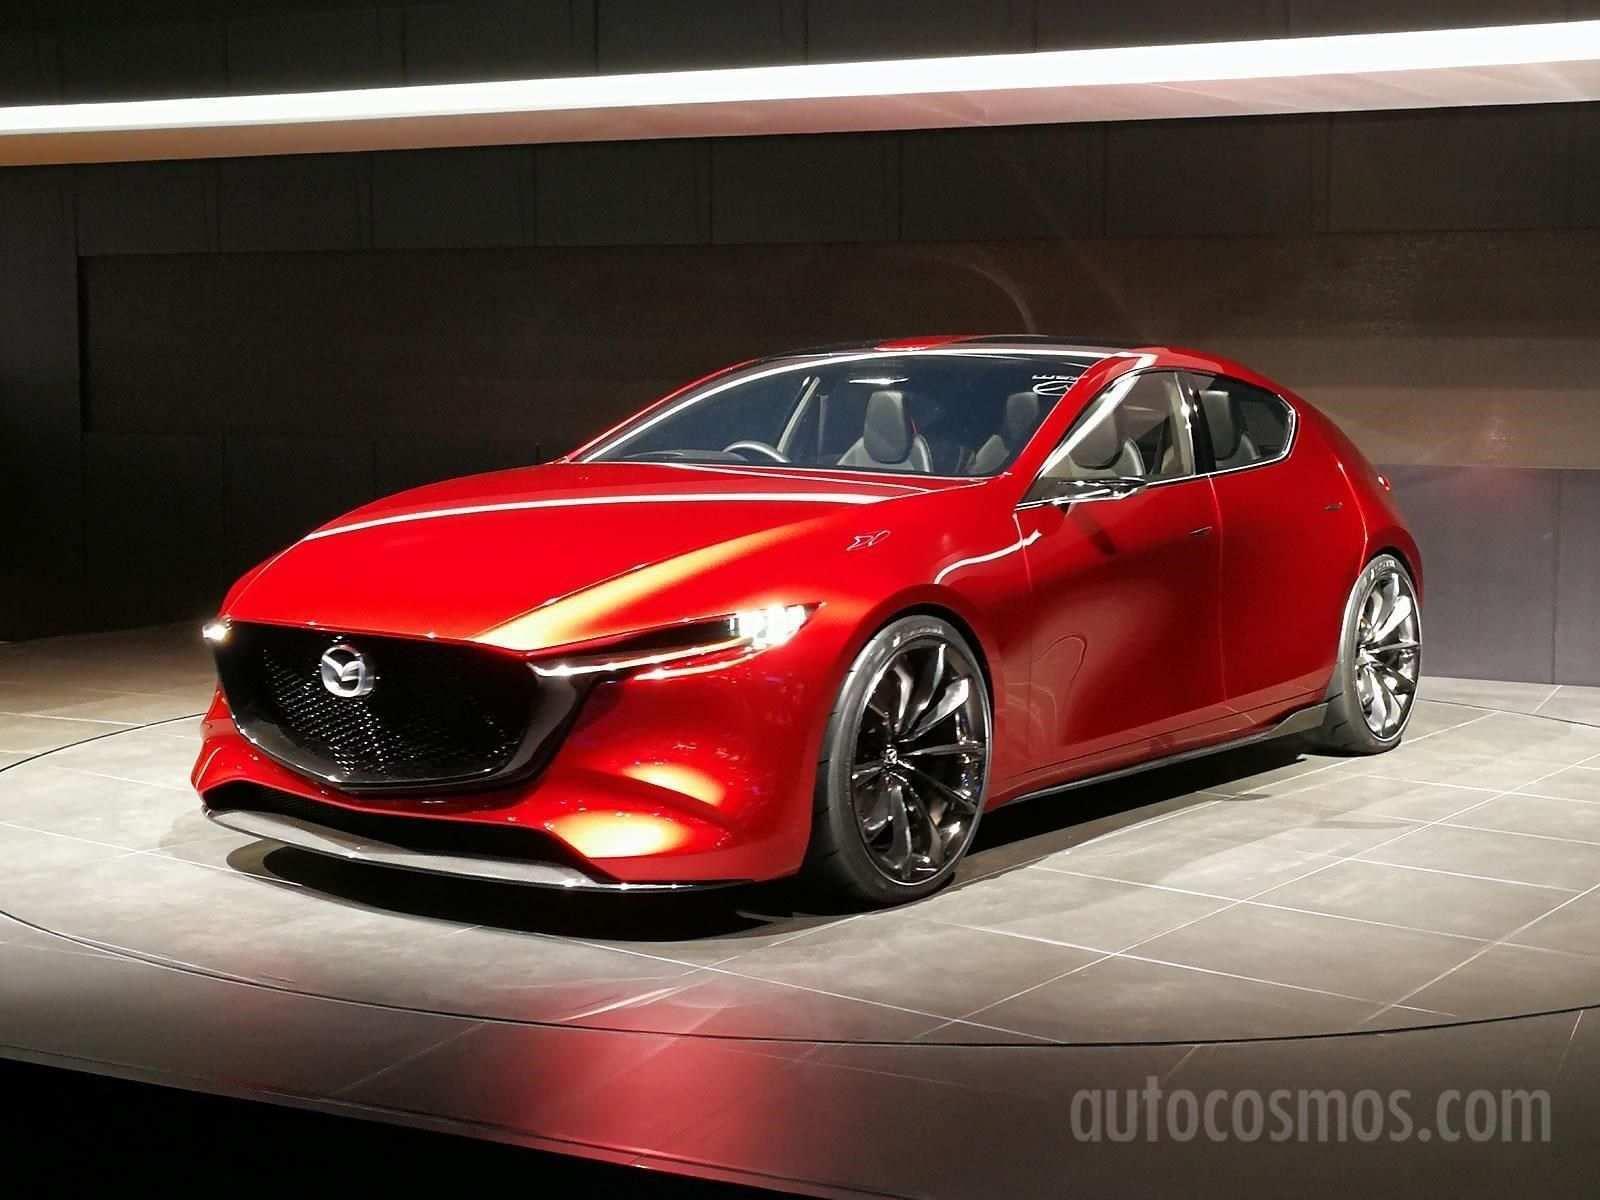 41 Great Mazda Kai 2020 Precio Performance for Mazda Kai 2020 Precio